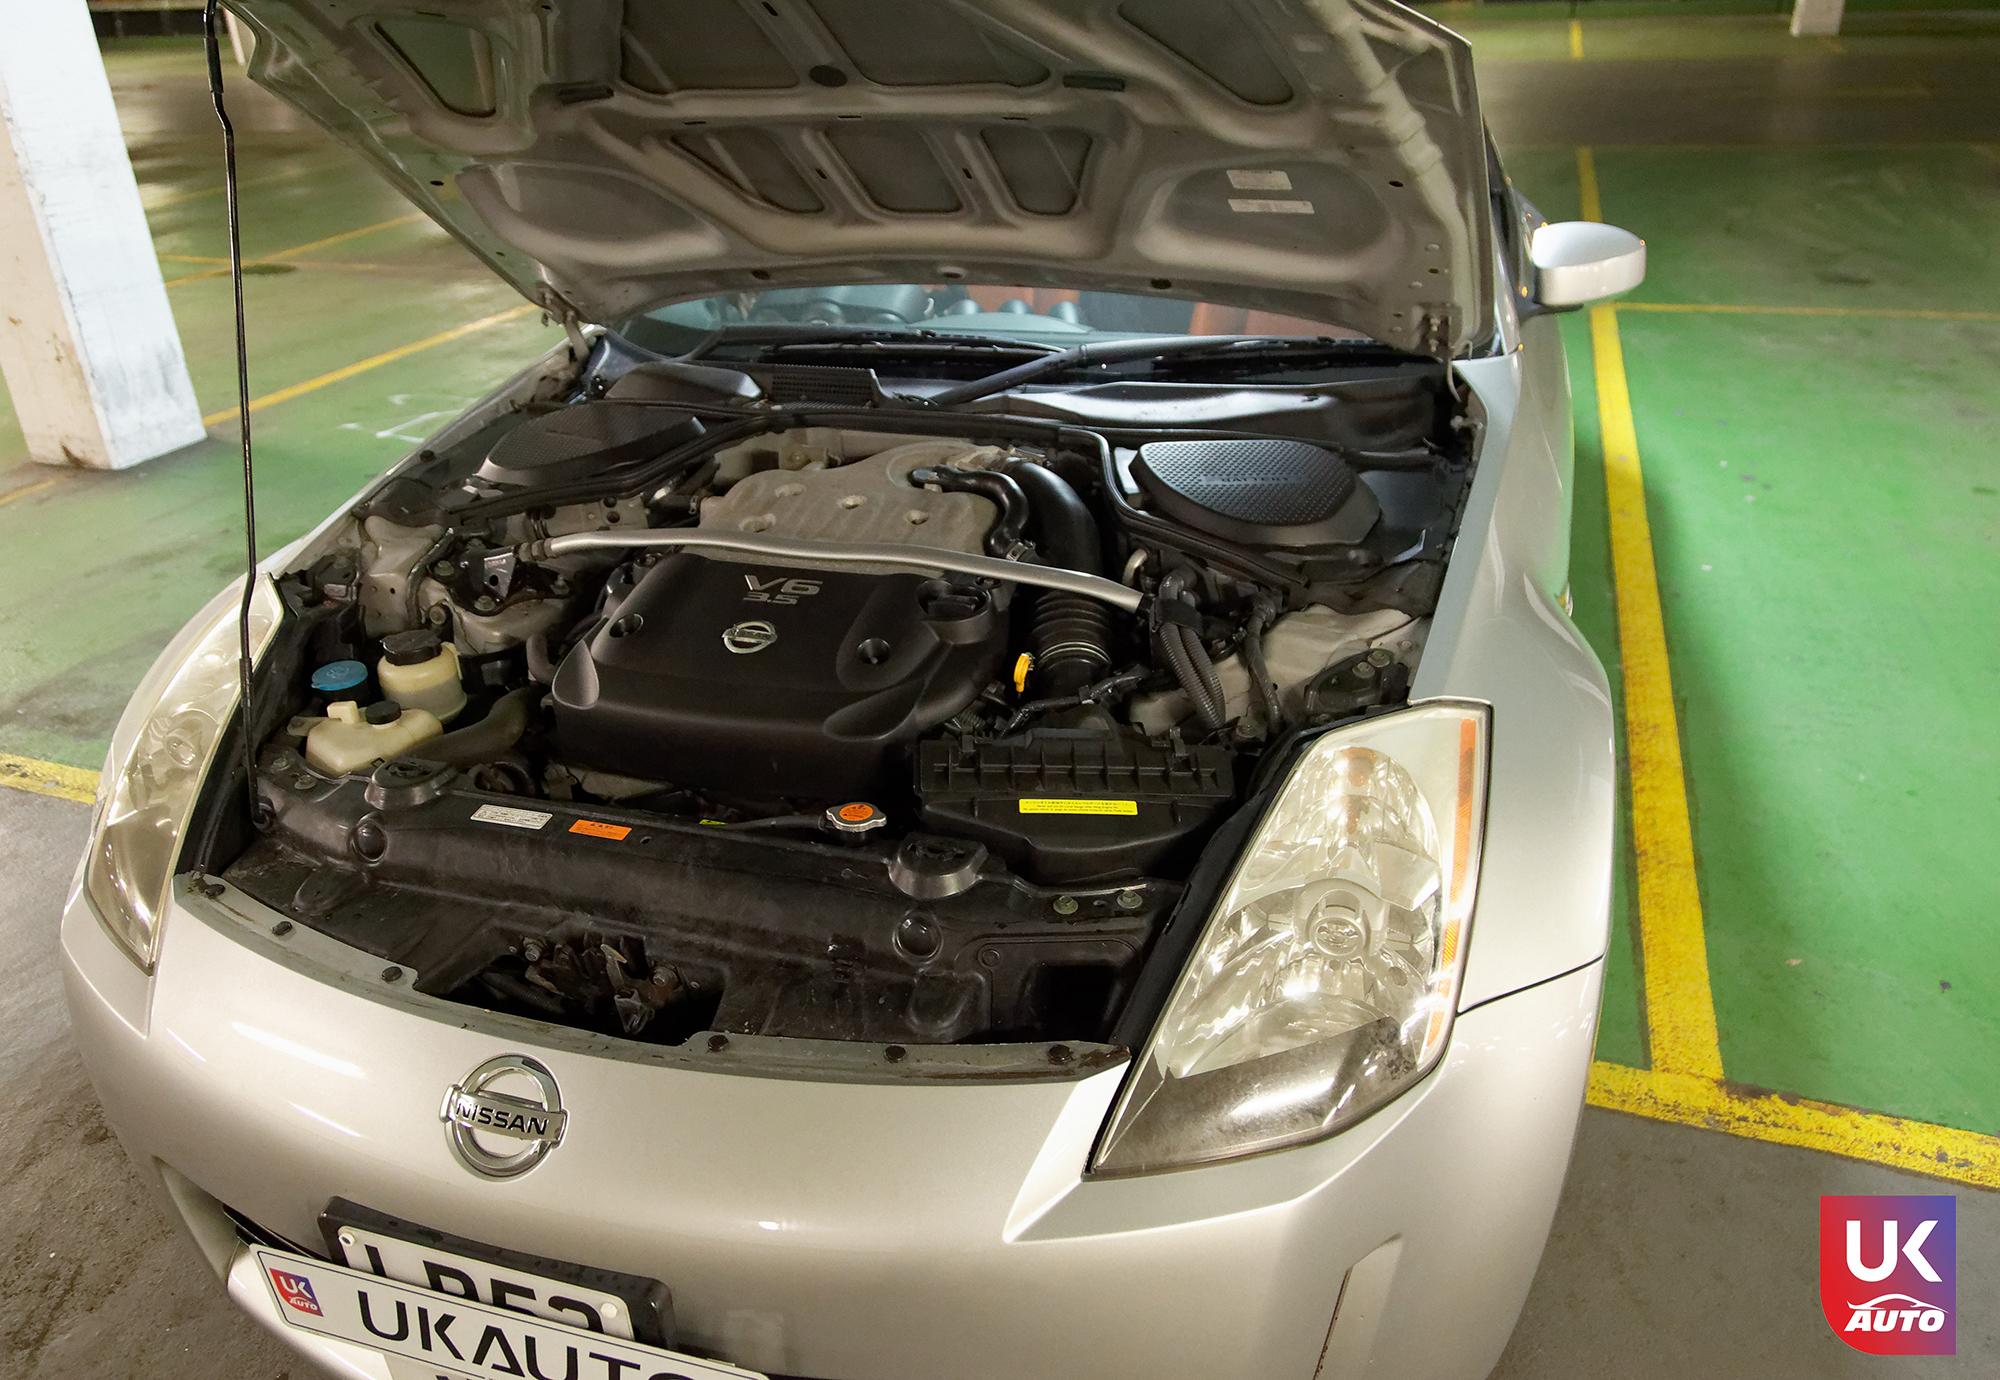 Ukauto import nissan 350z jdm import fairlady v6 import uk ukauto rhd nissan import uk10 - Import Nissan 350Z JDM IMPORT 3.5 V6 TIPTRONIC IMPORT AUTO par UKAUTO